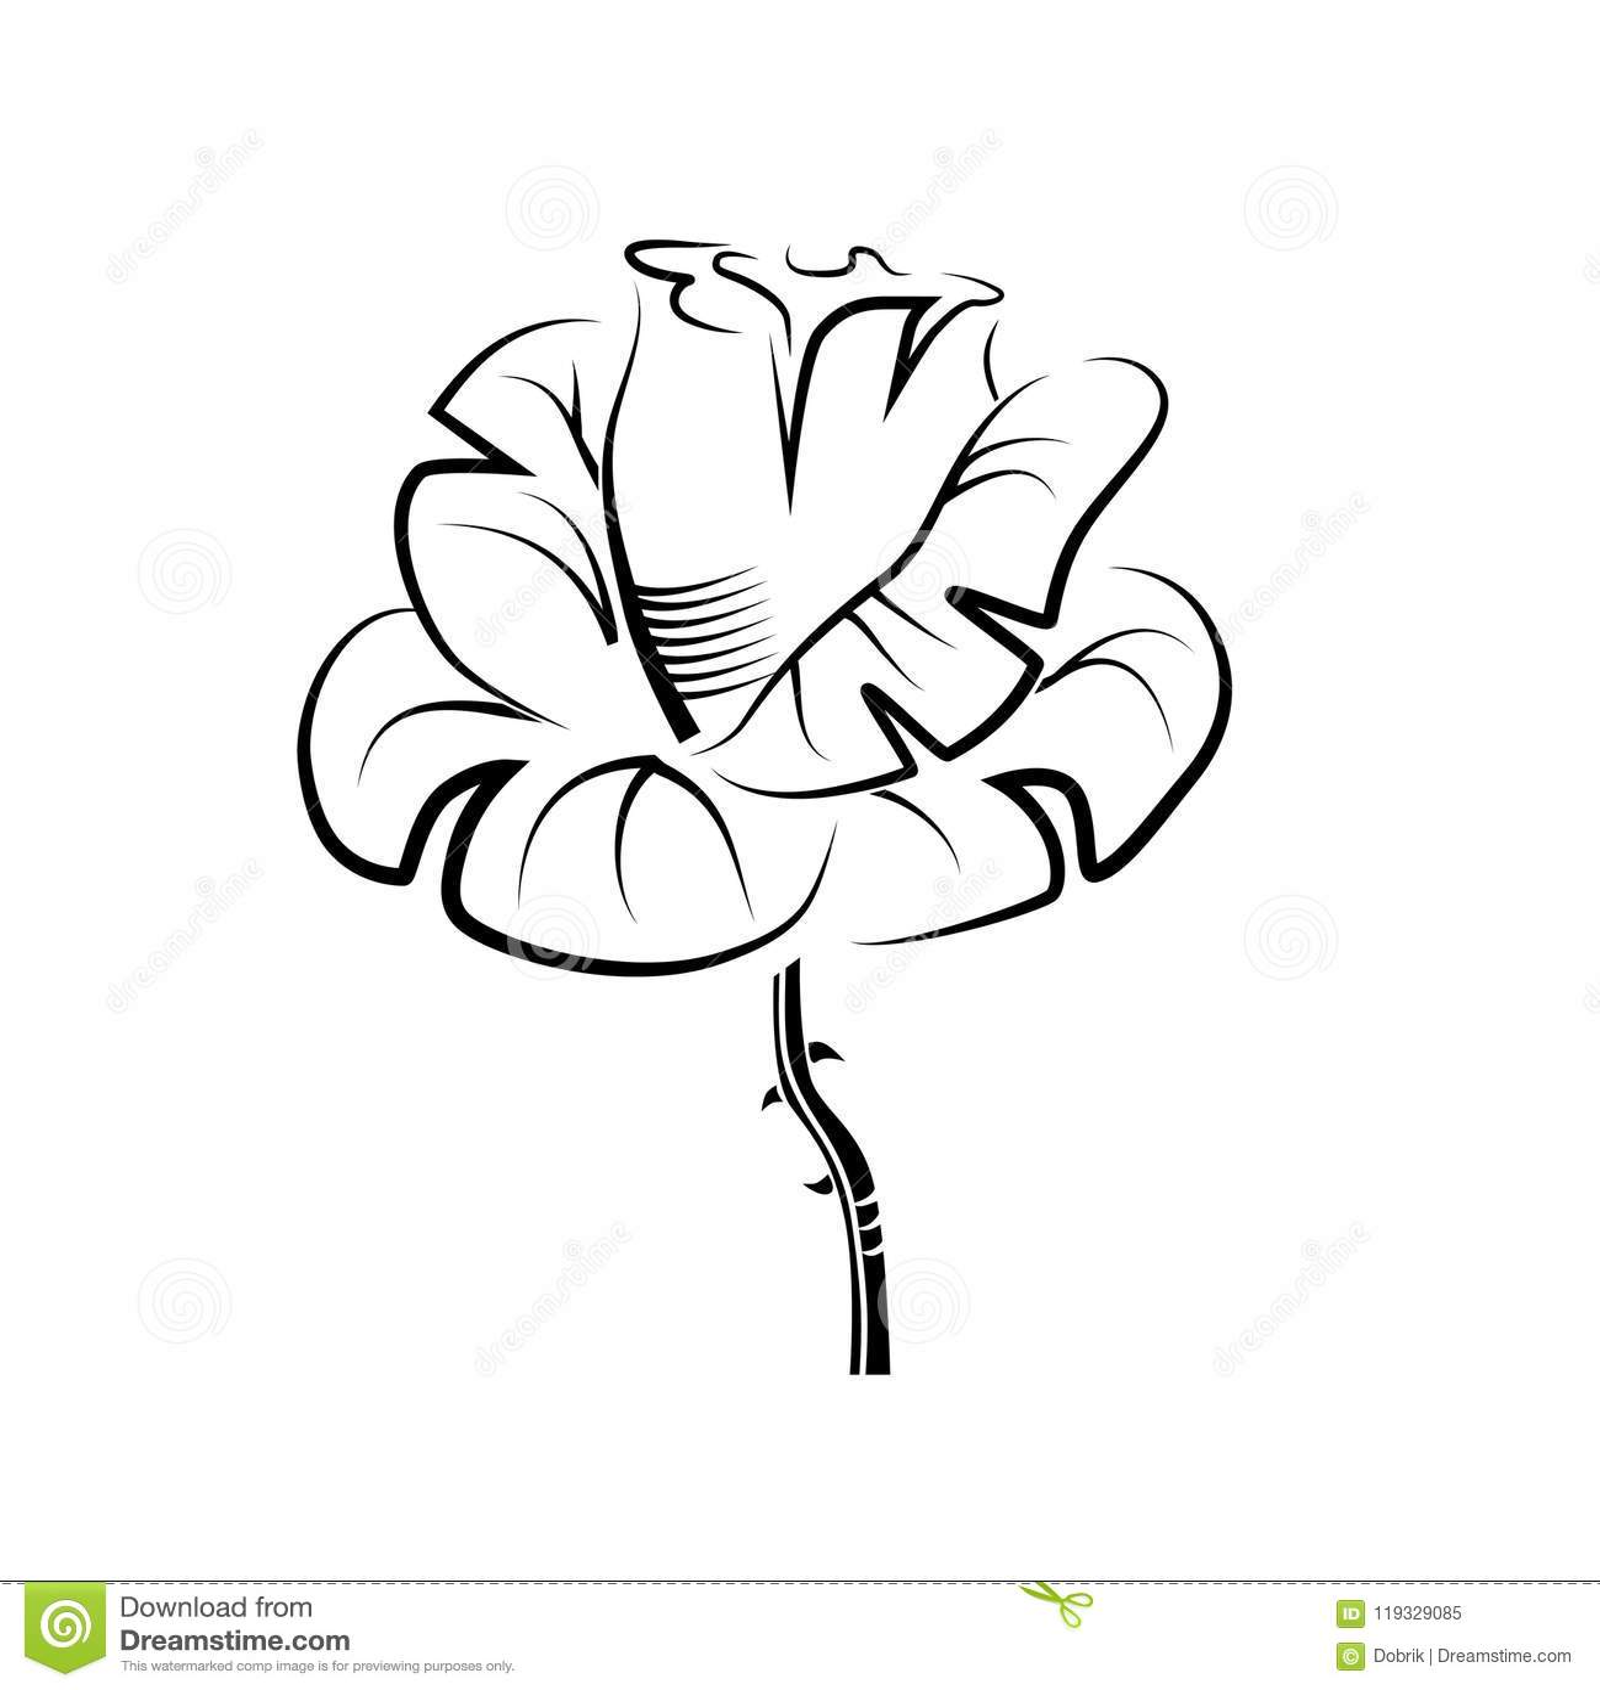 Vector Drawing Of A Rose Tattoo Logo Stock Vector Illustration